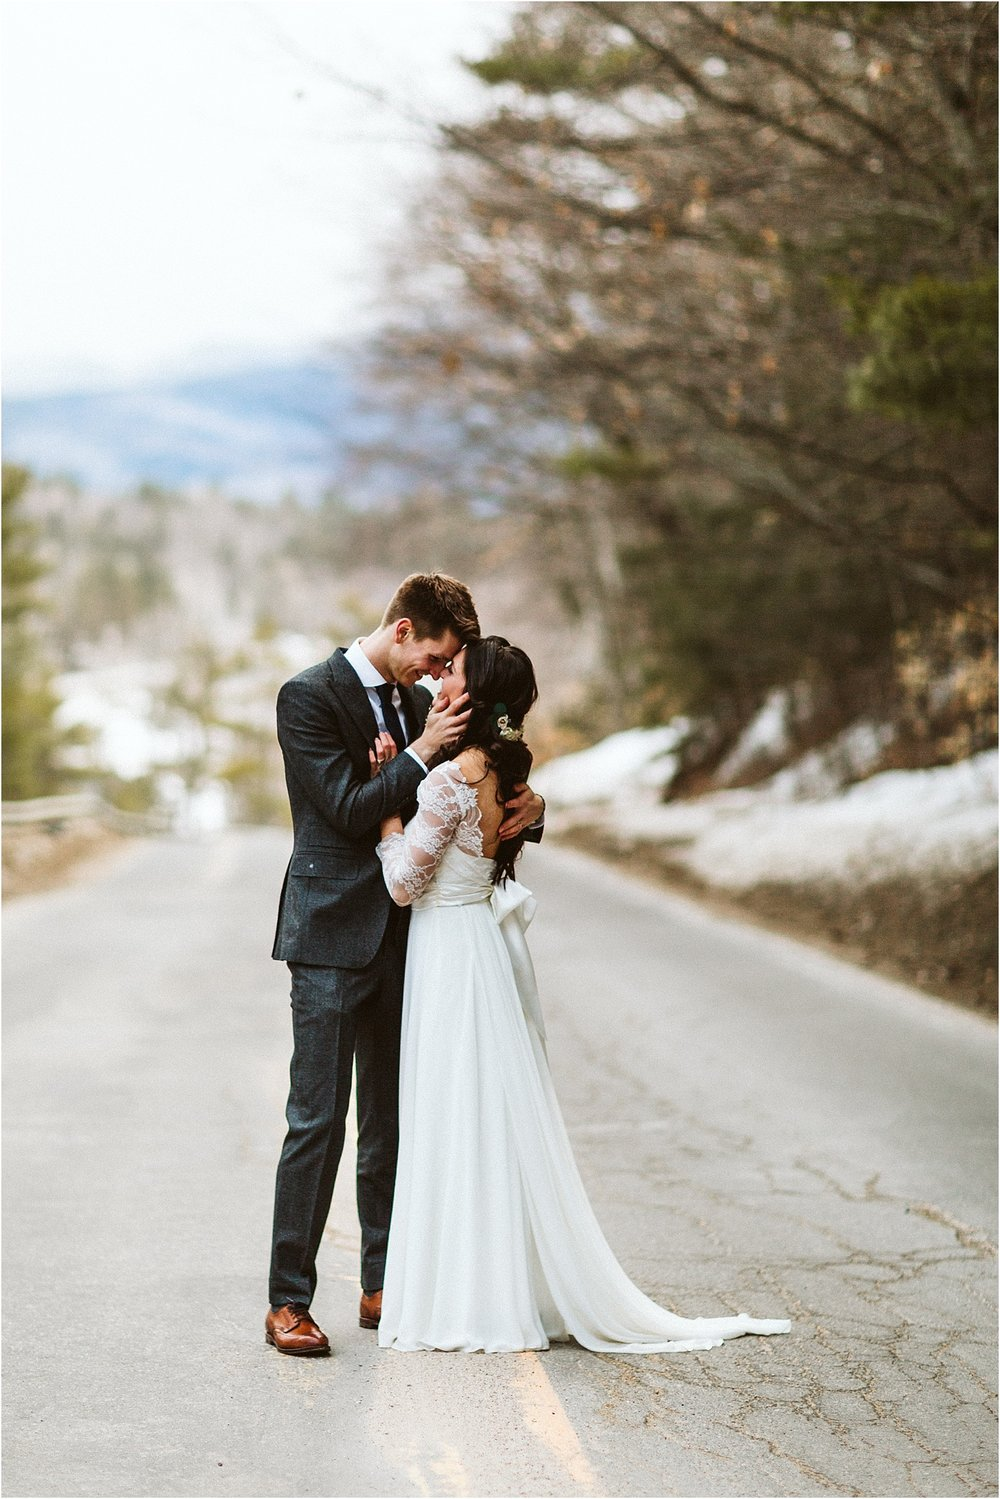 New Hampshire Winter Wedding_0142.jpg